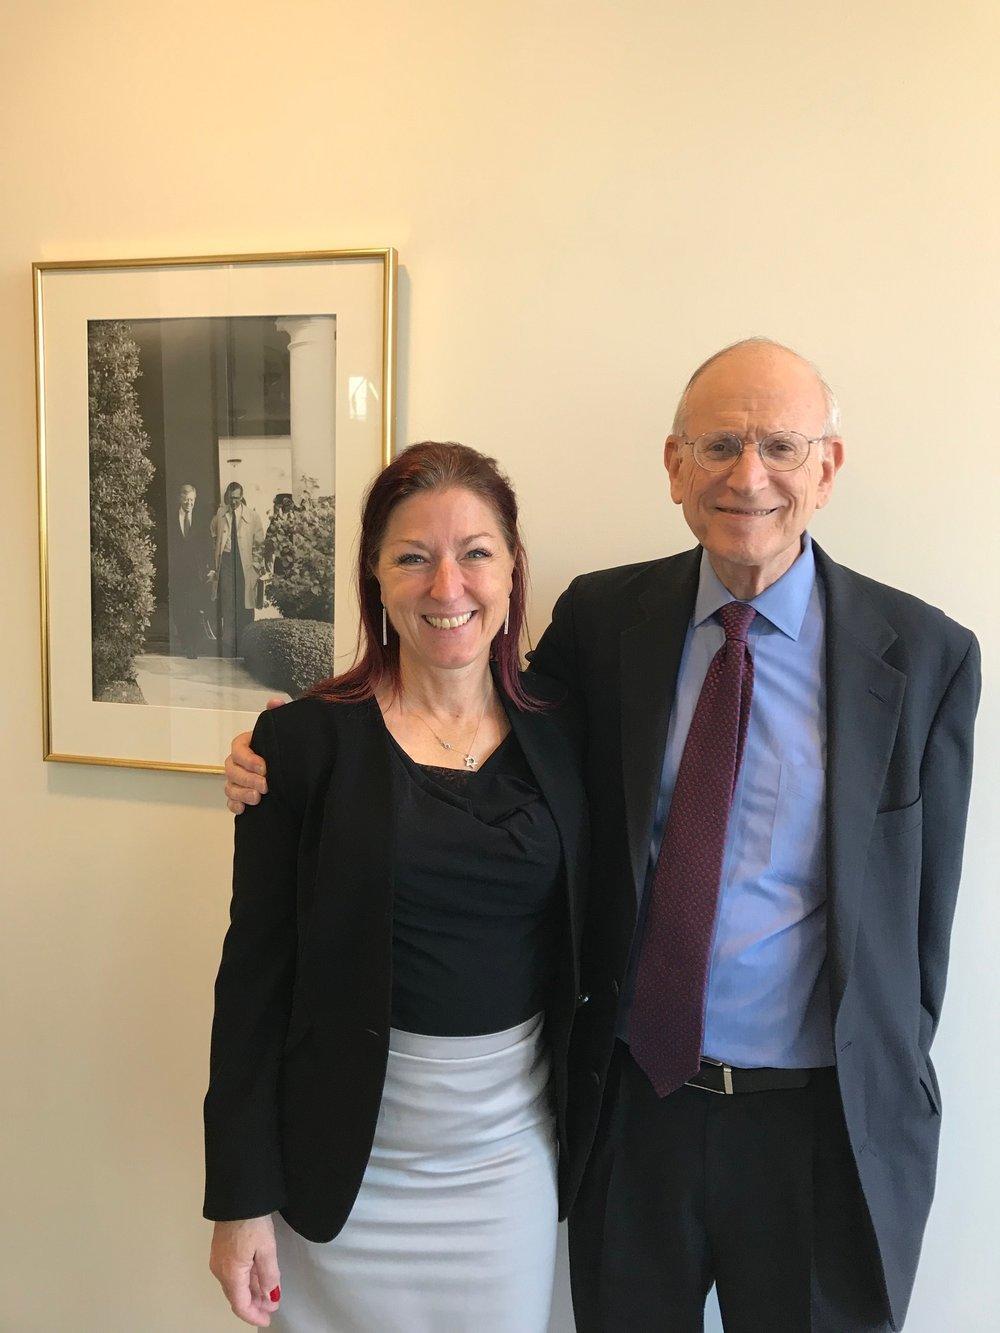 With Stuart Eizenstat, U.S. chief negotiator of the U.S.-Austrian Washington Agreement 2001 (on Holocaust justice)